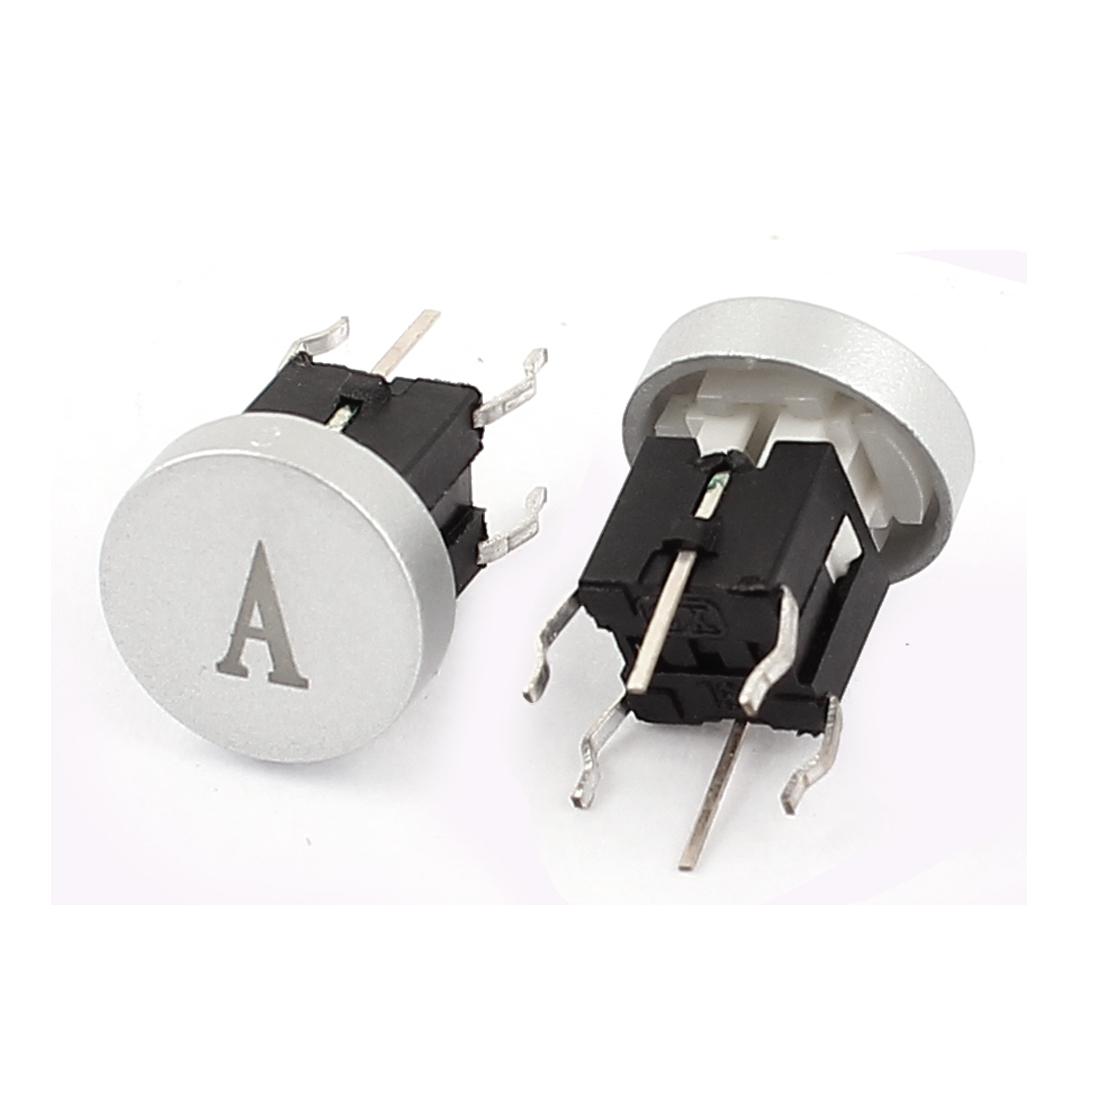 2 Pcs 6x6mm 4 Pin DIP PCB Lamp Push Button Tactile Tact Switch w A Cap